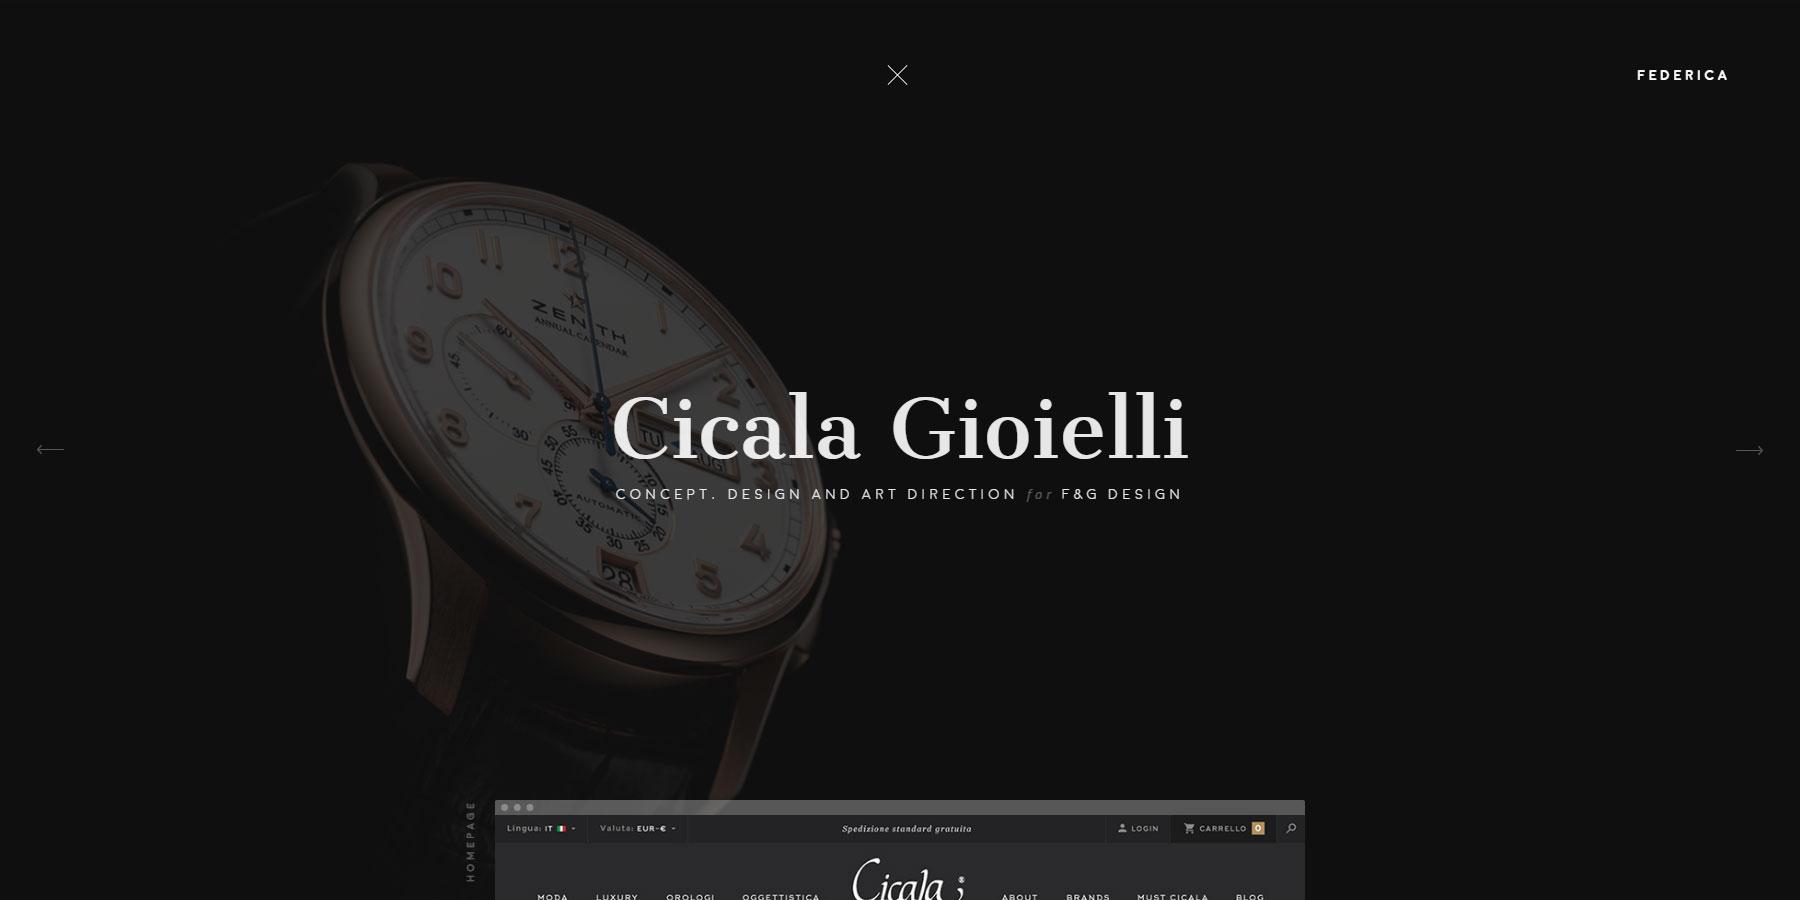 Federica Gandolfo - Portfolio - Website of the Day